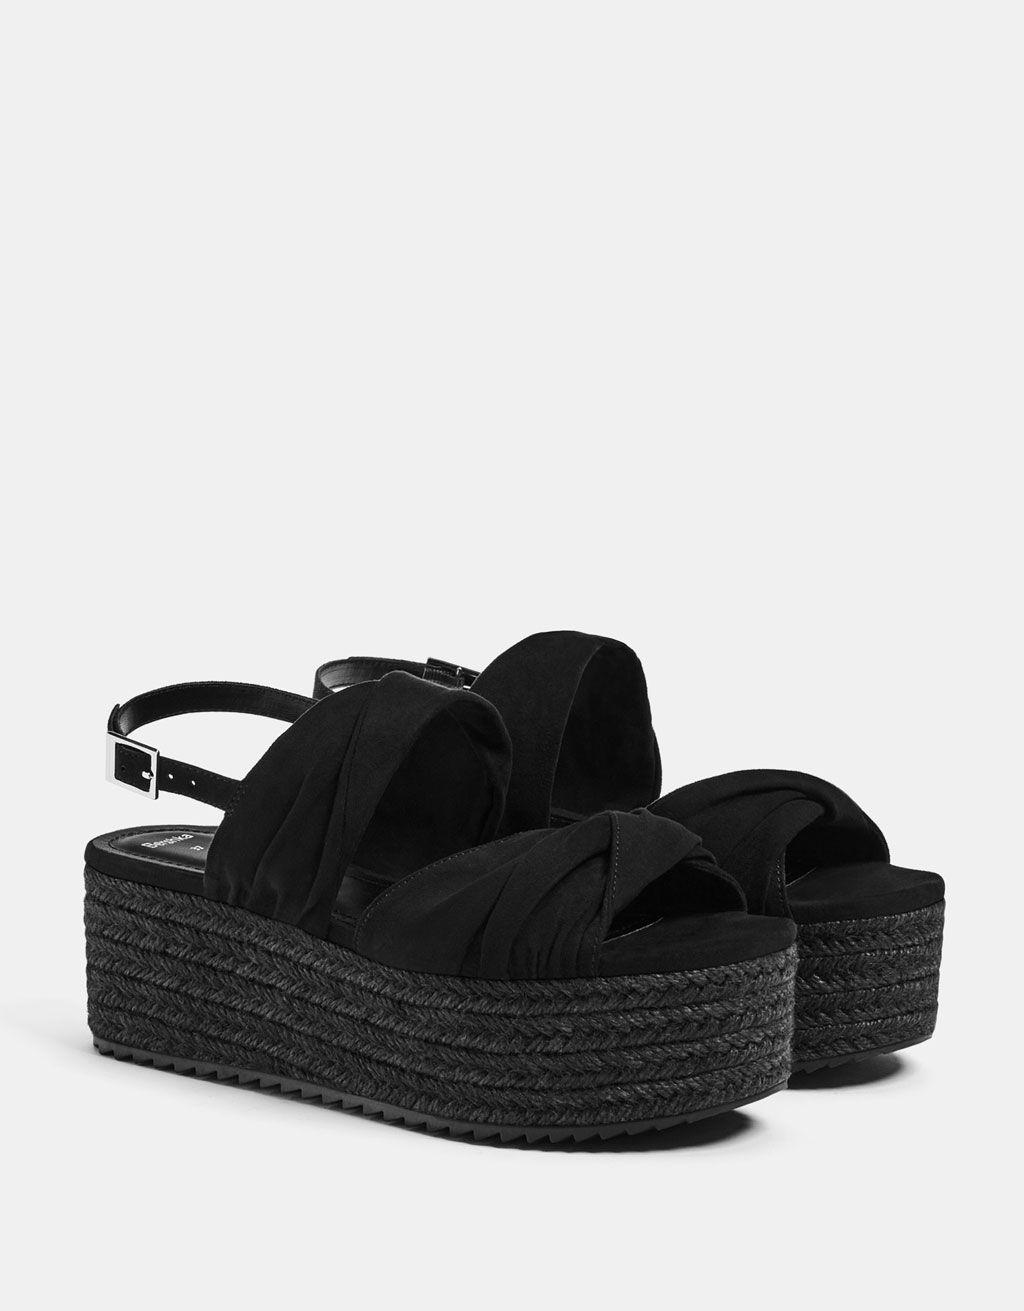 b50a8c3c63ed Black jute platform sandals in 2019